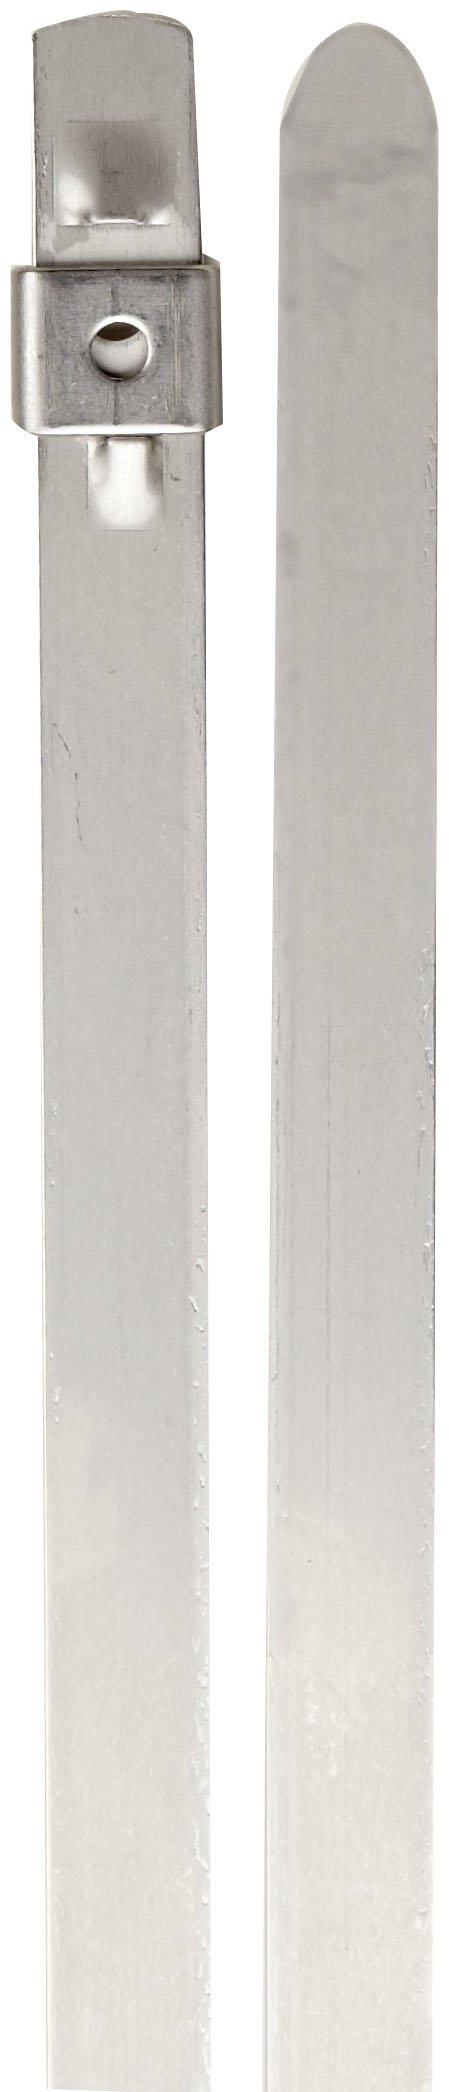 BAND-IT AS6249 Tie-Lok 304 Stainless Steel Cable Tie, 3/8'' Width, 24'' Length, 6'' Maximum Diameter, 100 per Bag